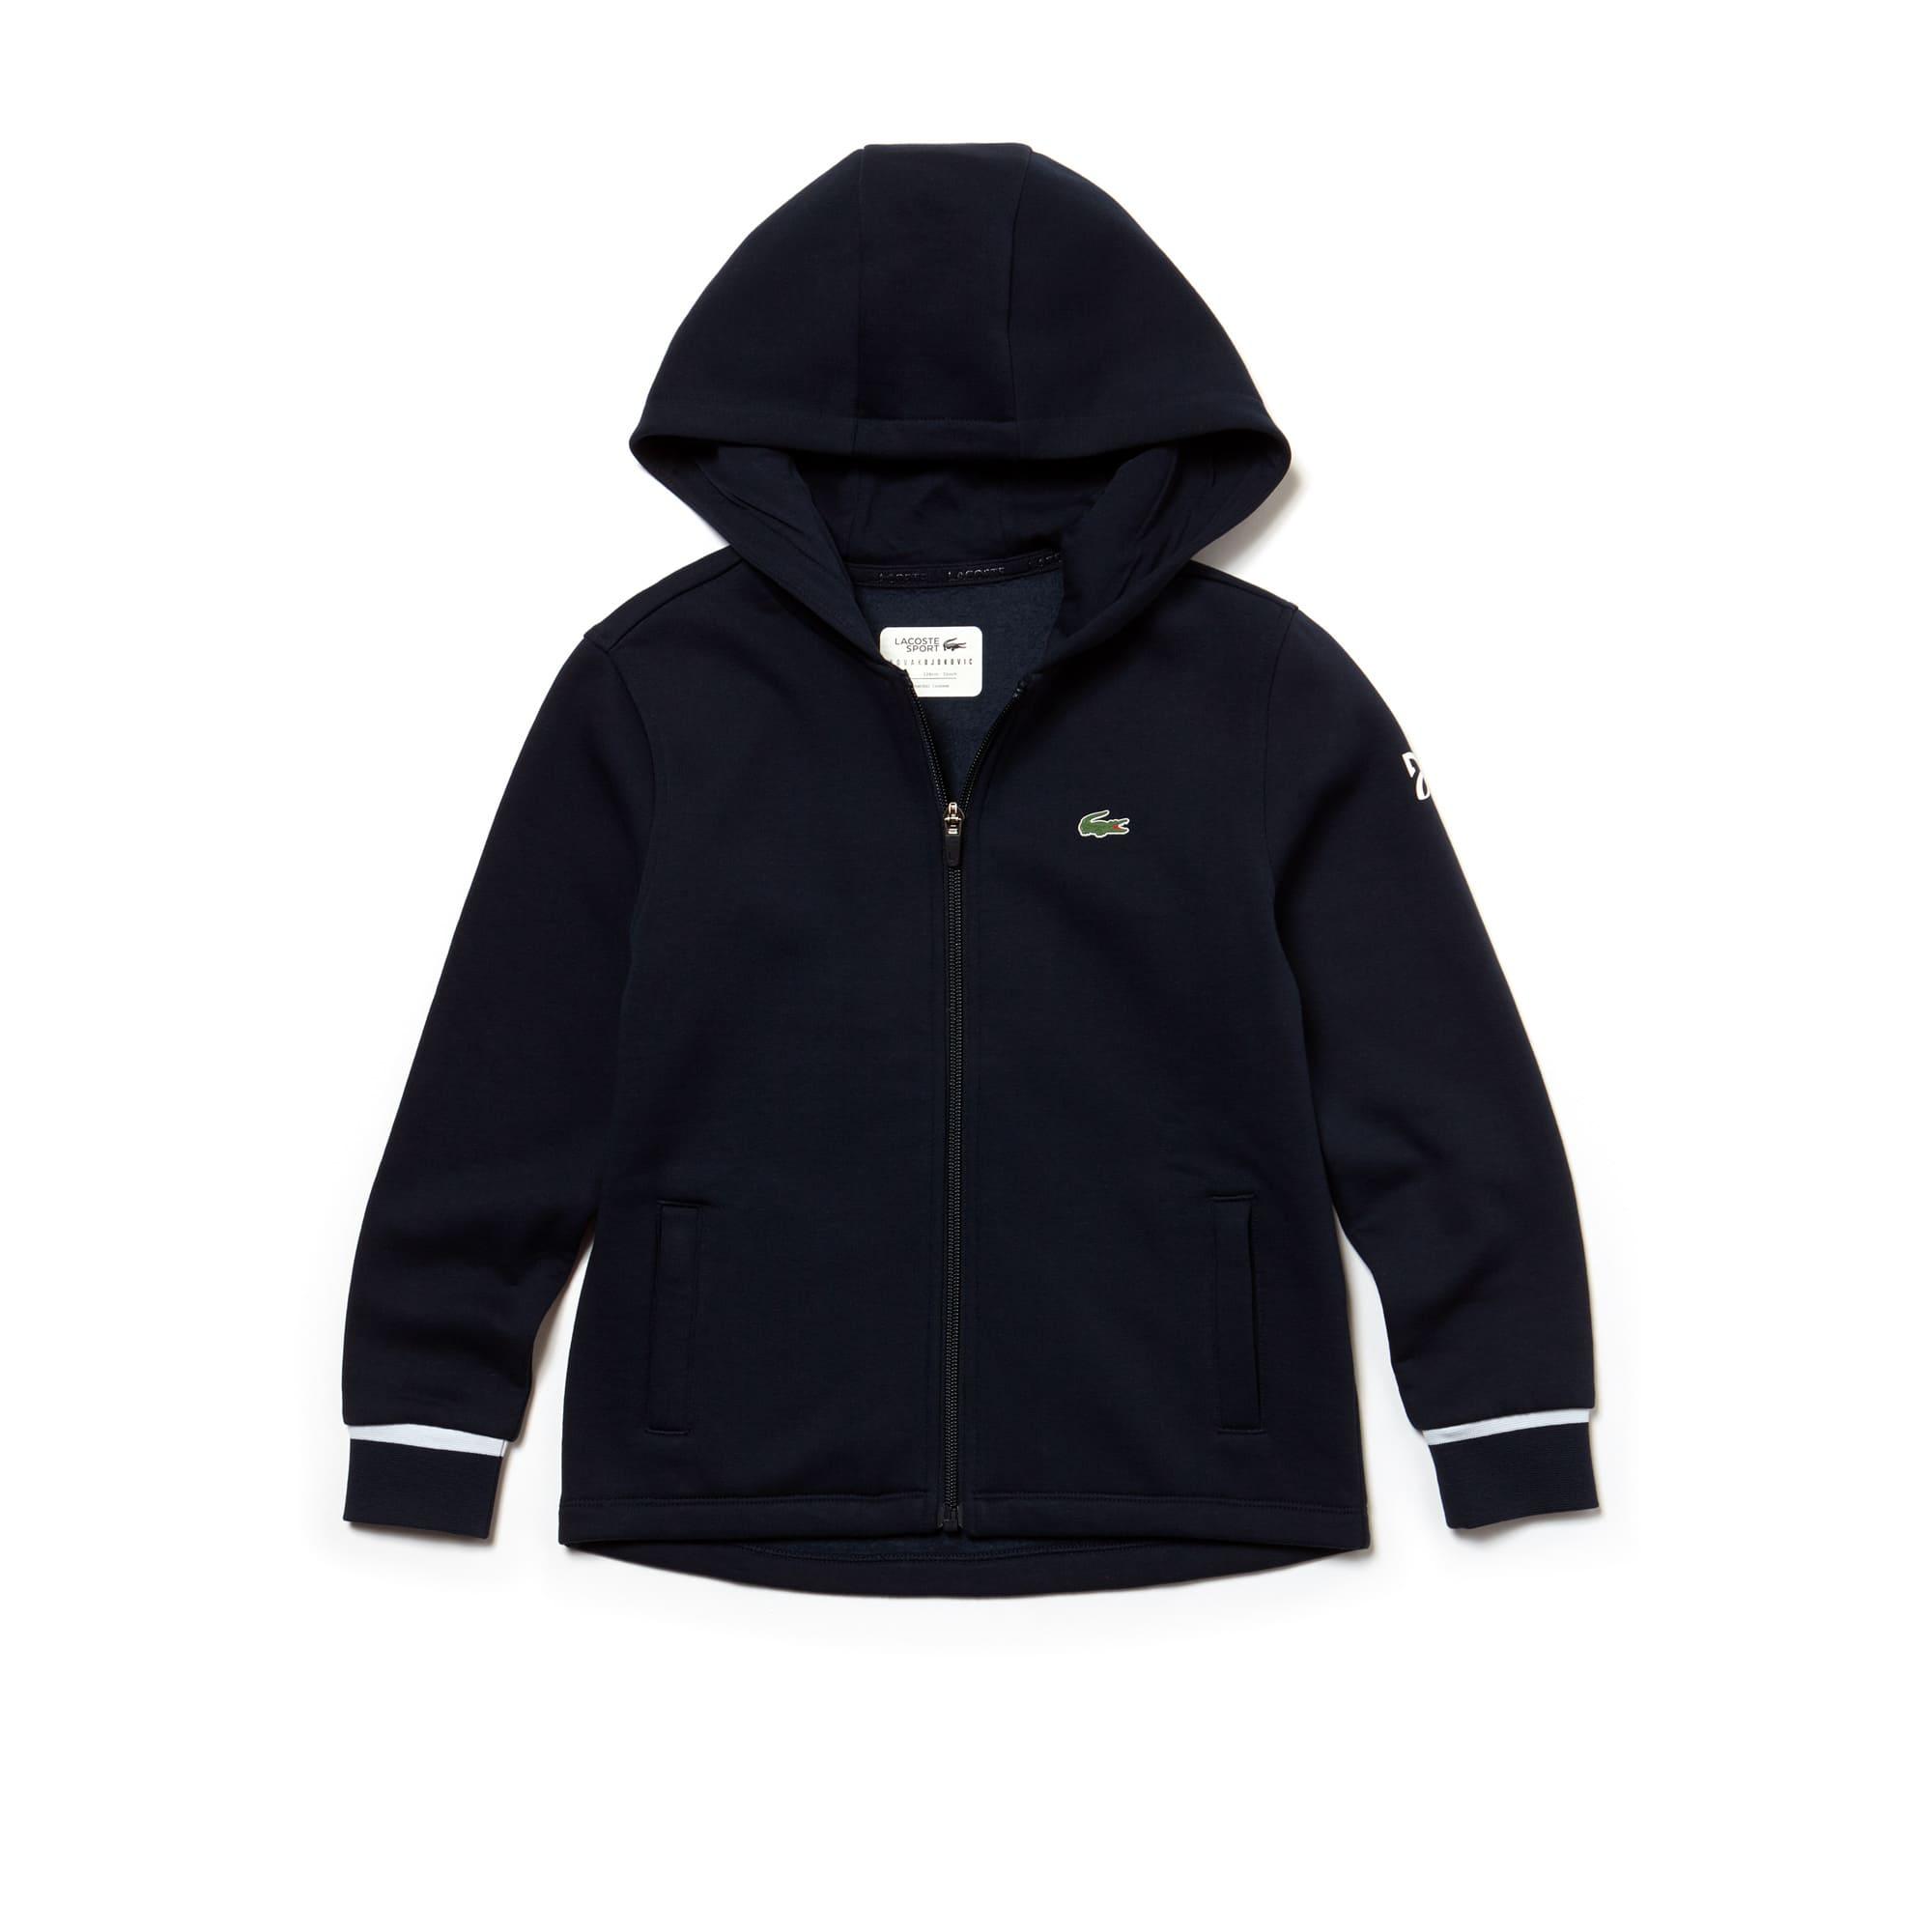 Sweatshirt à capuche Garçon Lacoste SPORT COLLECTION NOVAK DJOKOVIC SUPPORT WITH STYLE en molleton